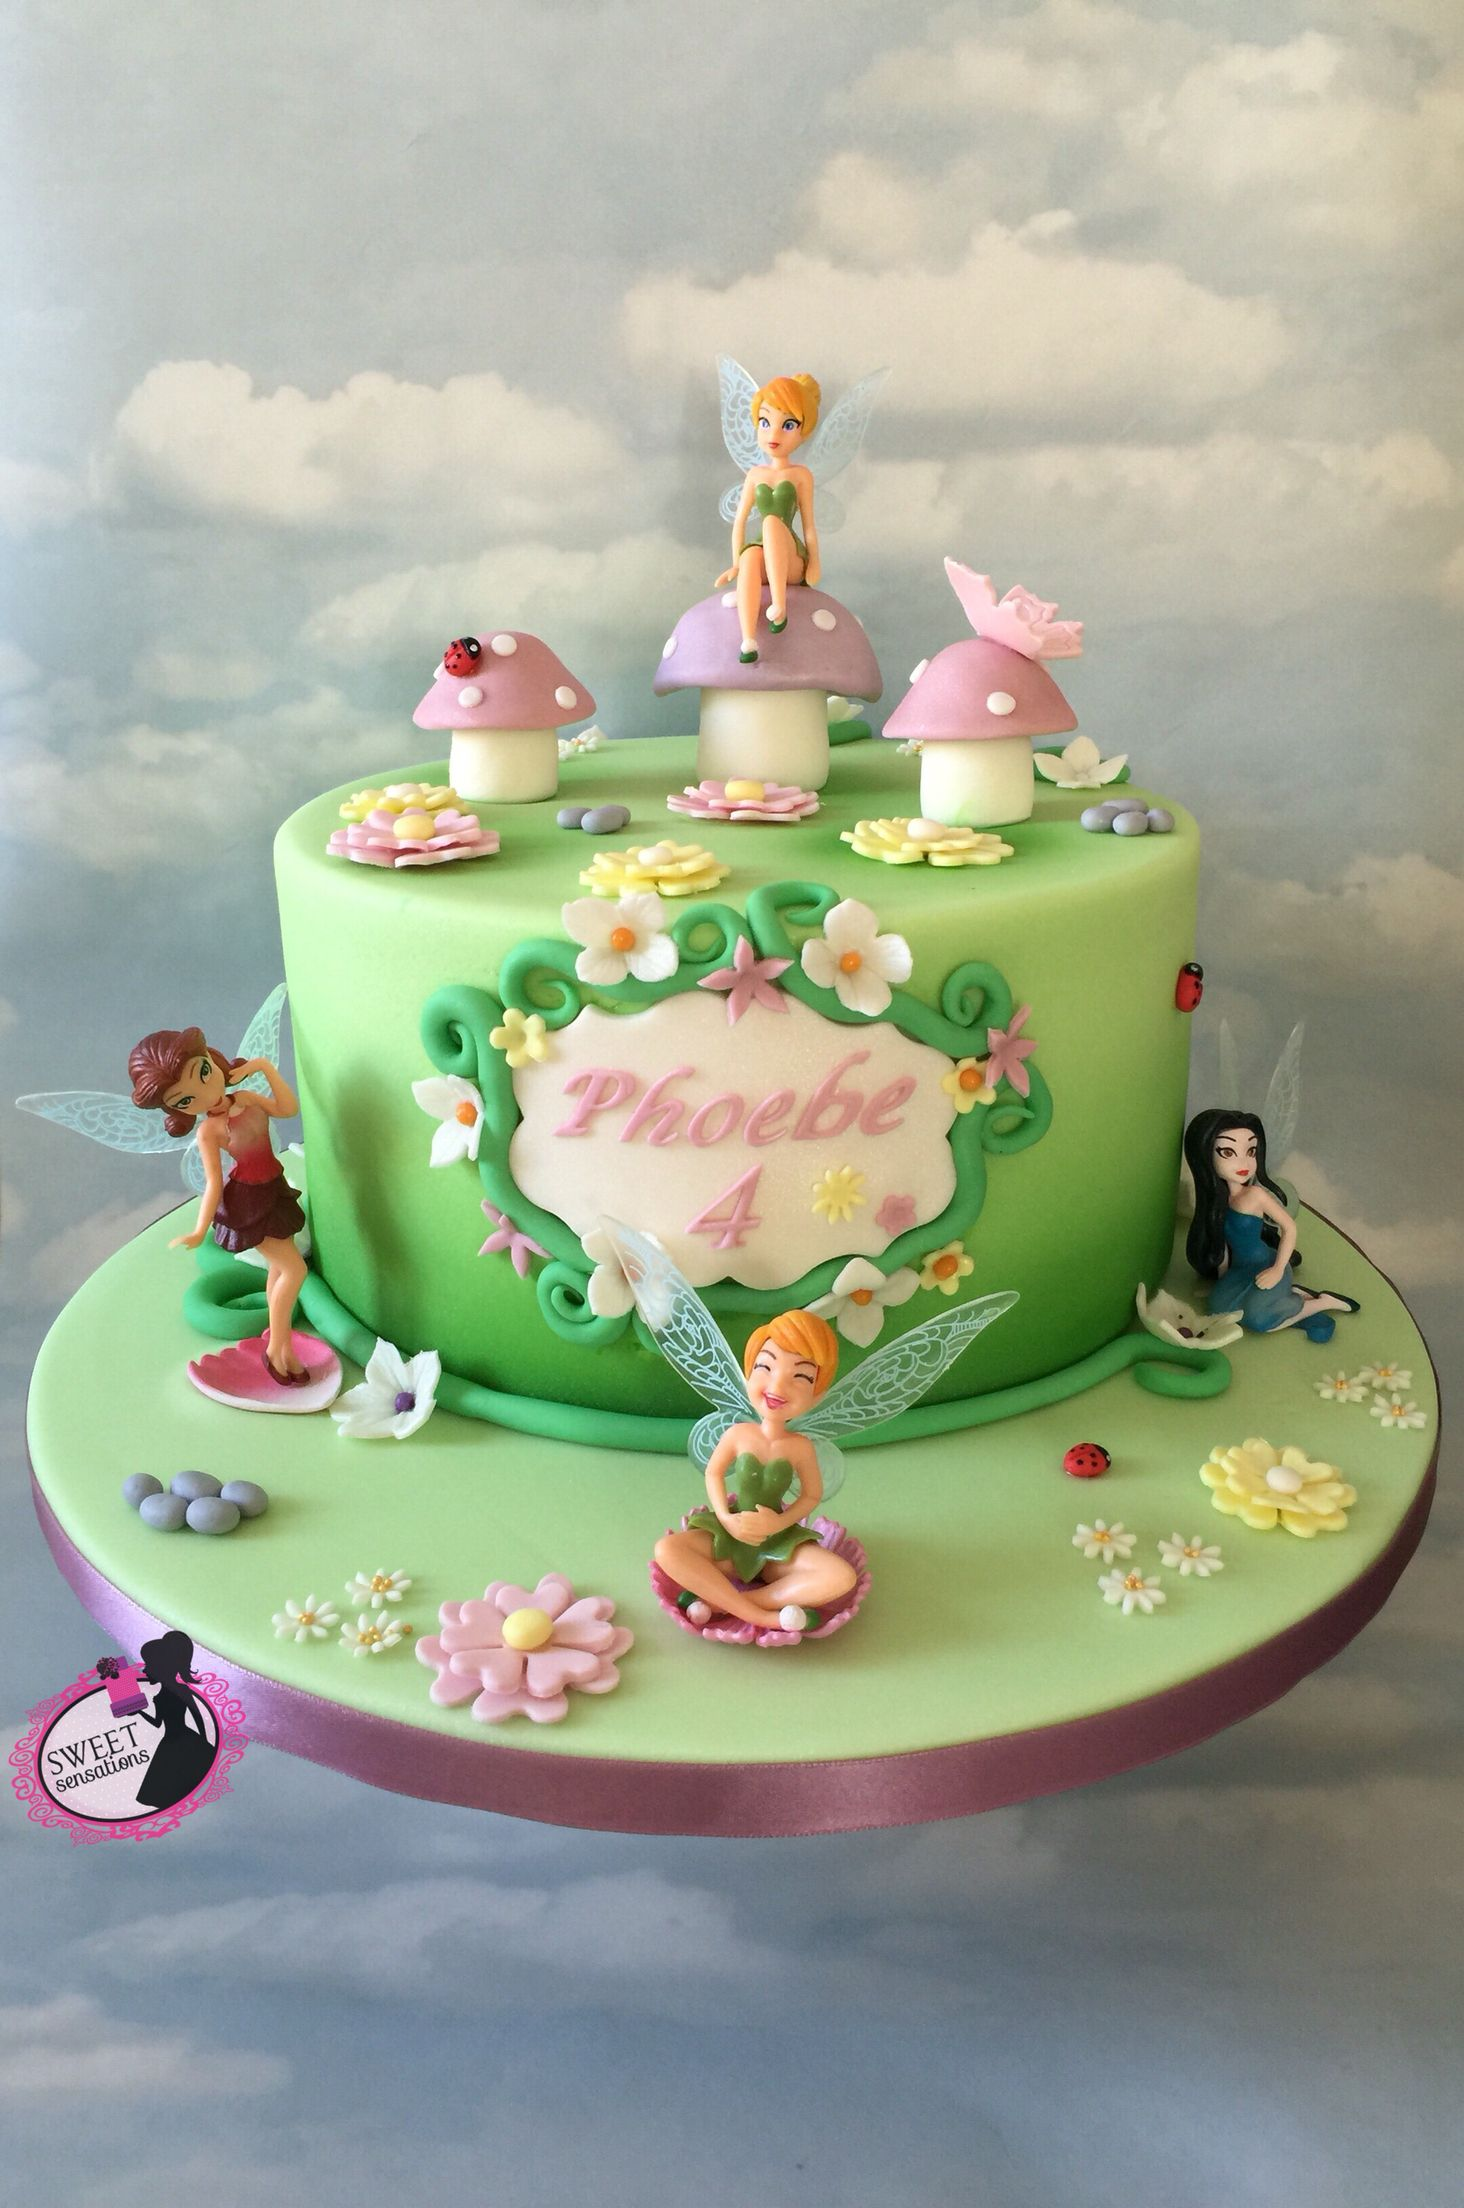 Cake Designs Tinkerbell : Tinkerbell cake cake ideas Pinterest Tinkerbell ...